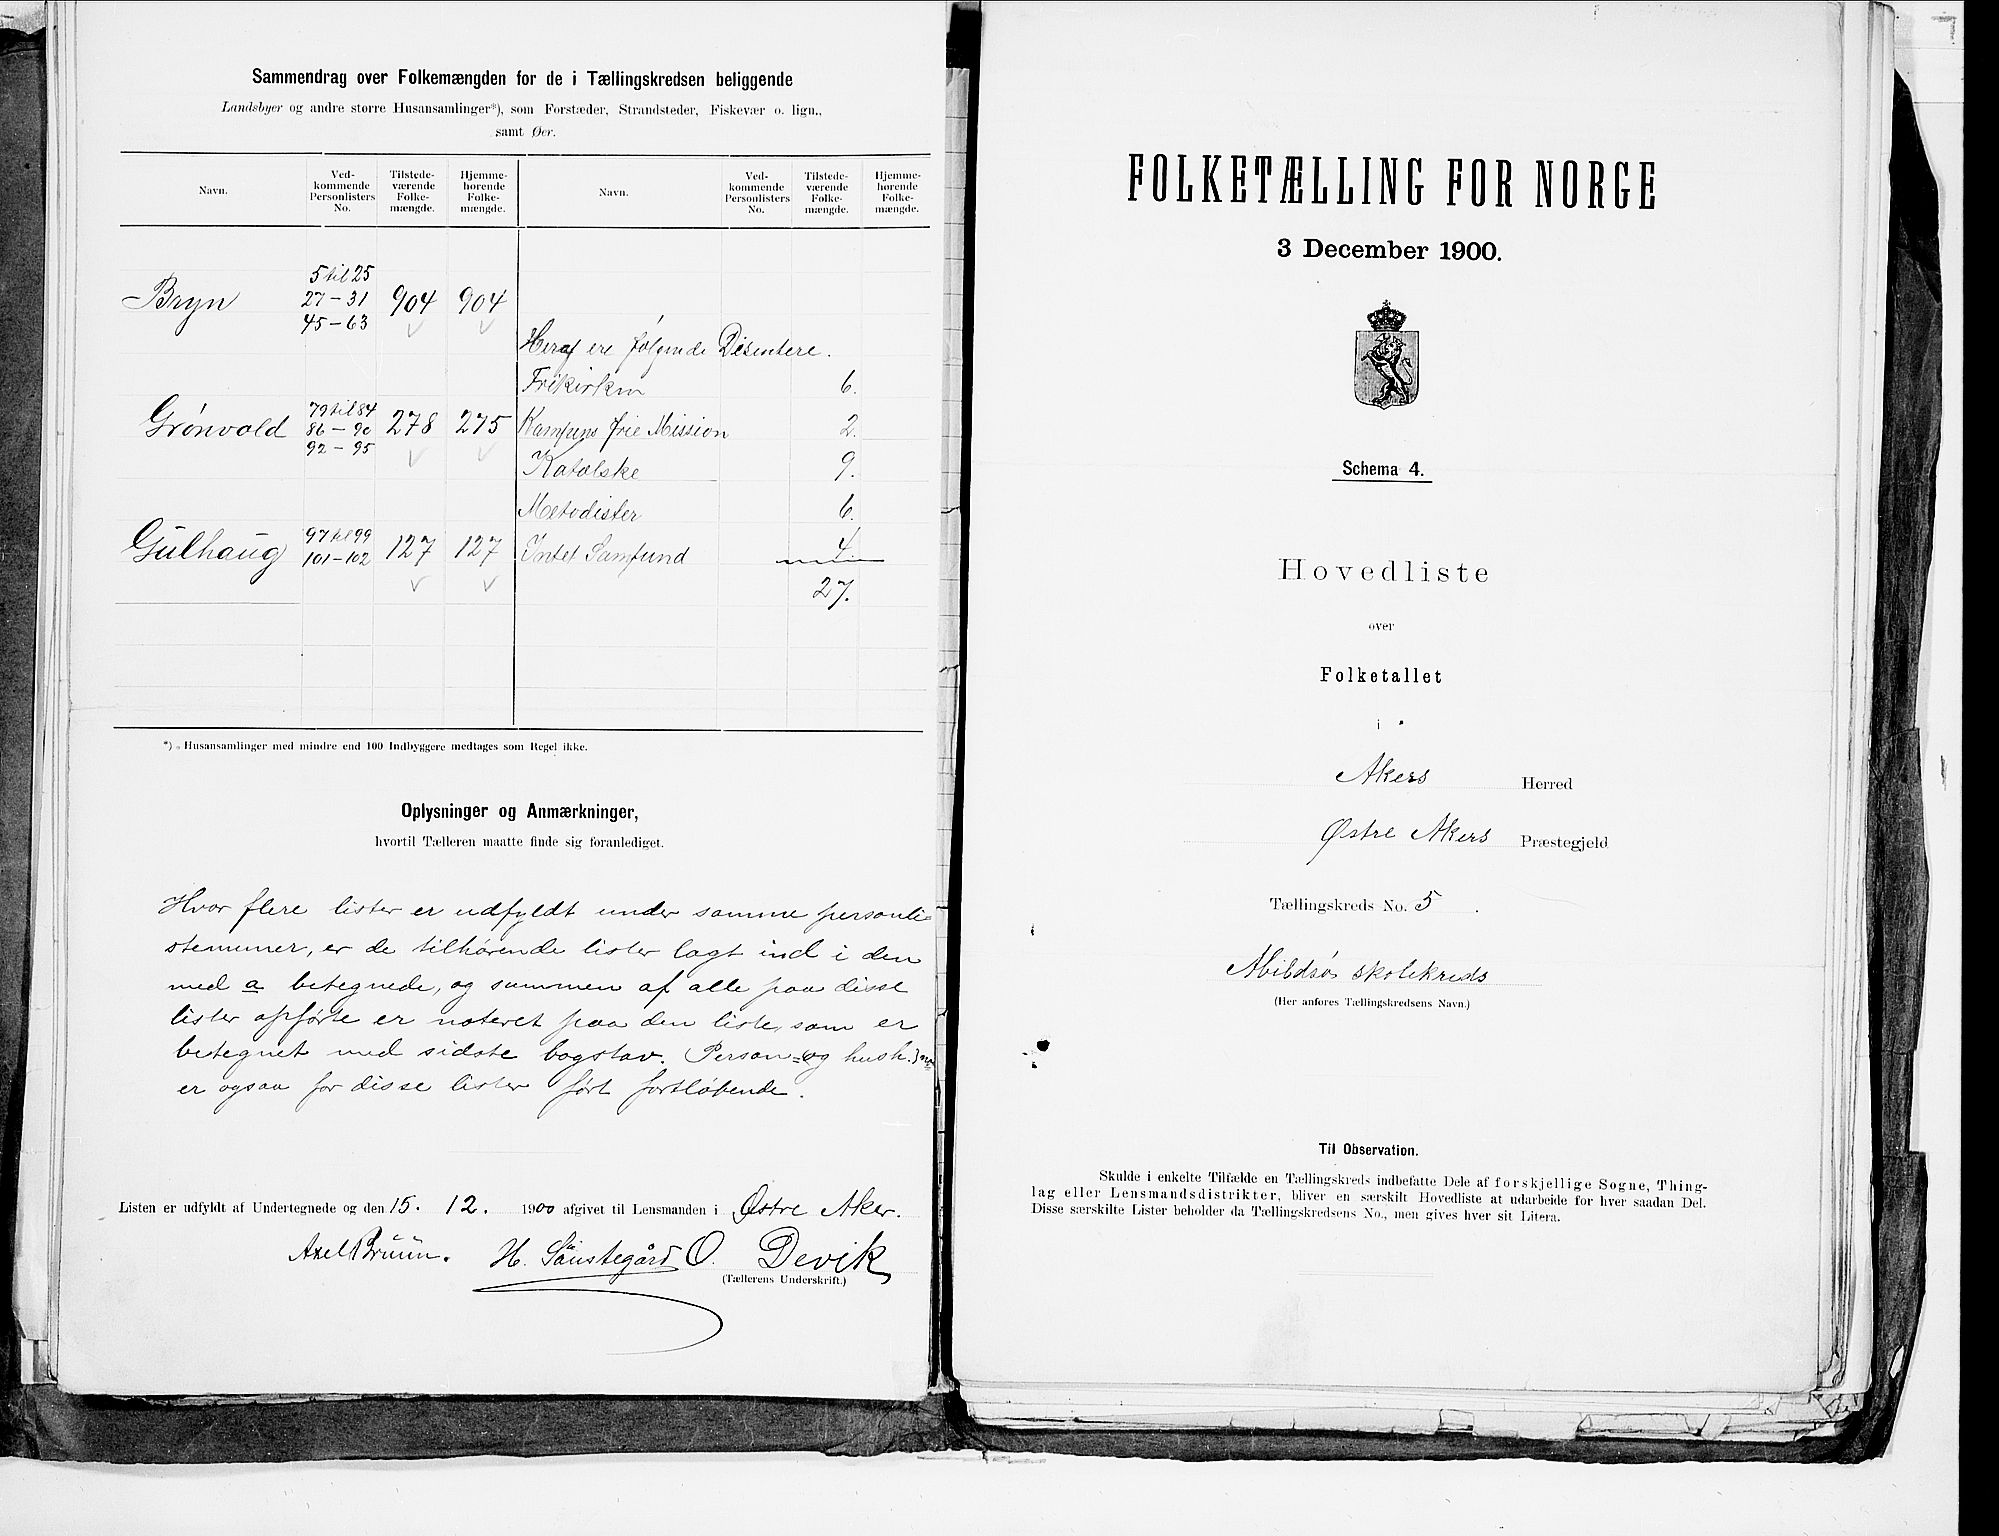 SAO, 1900 census for Aker, 1900, p. 21